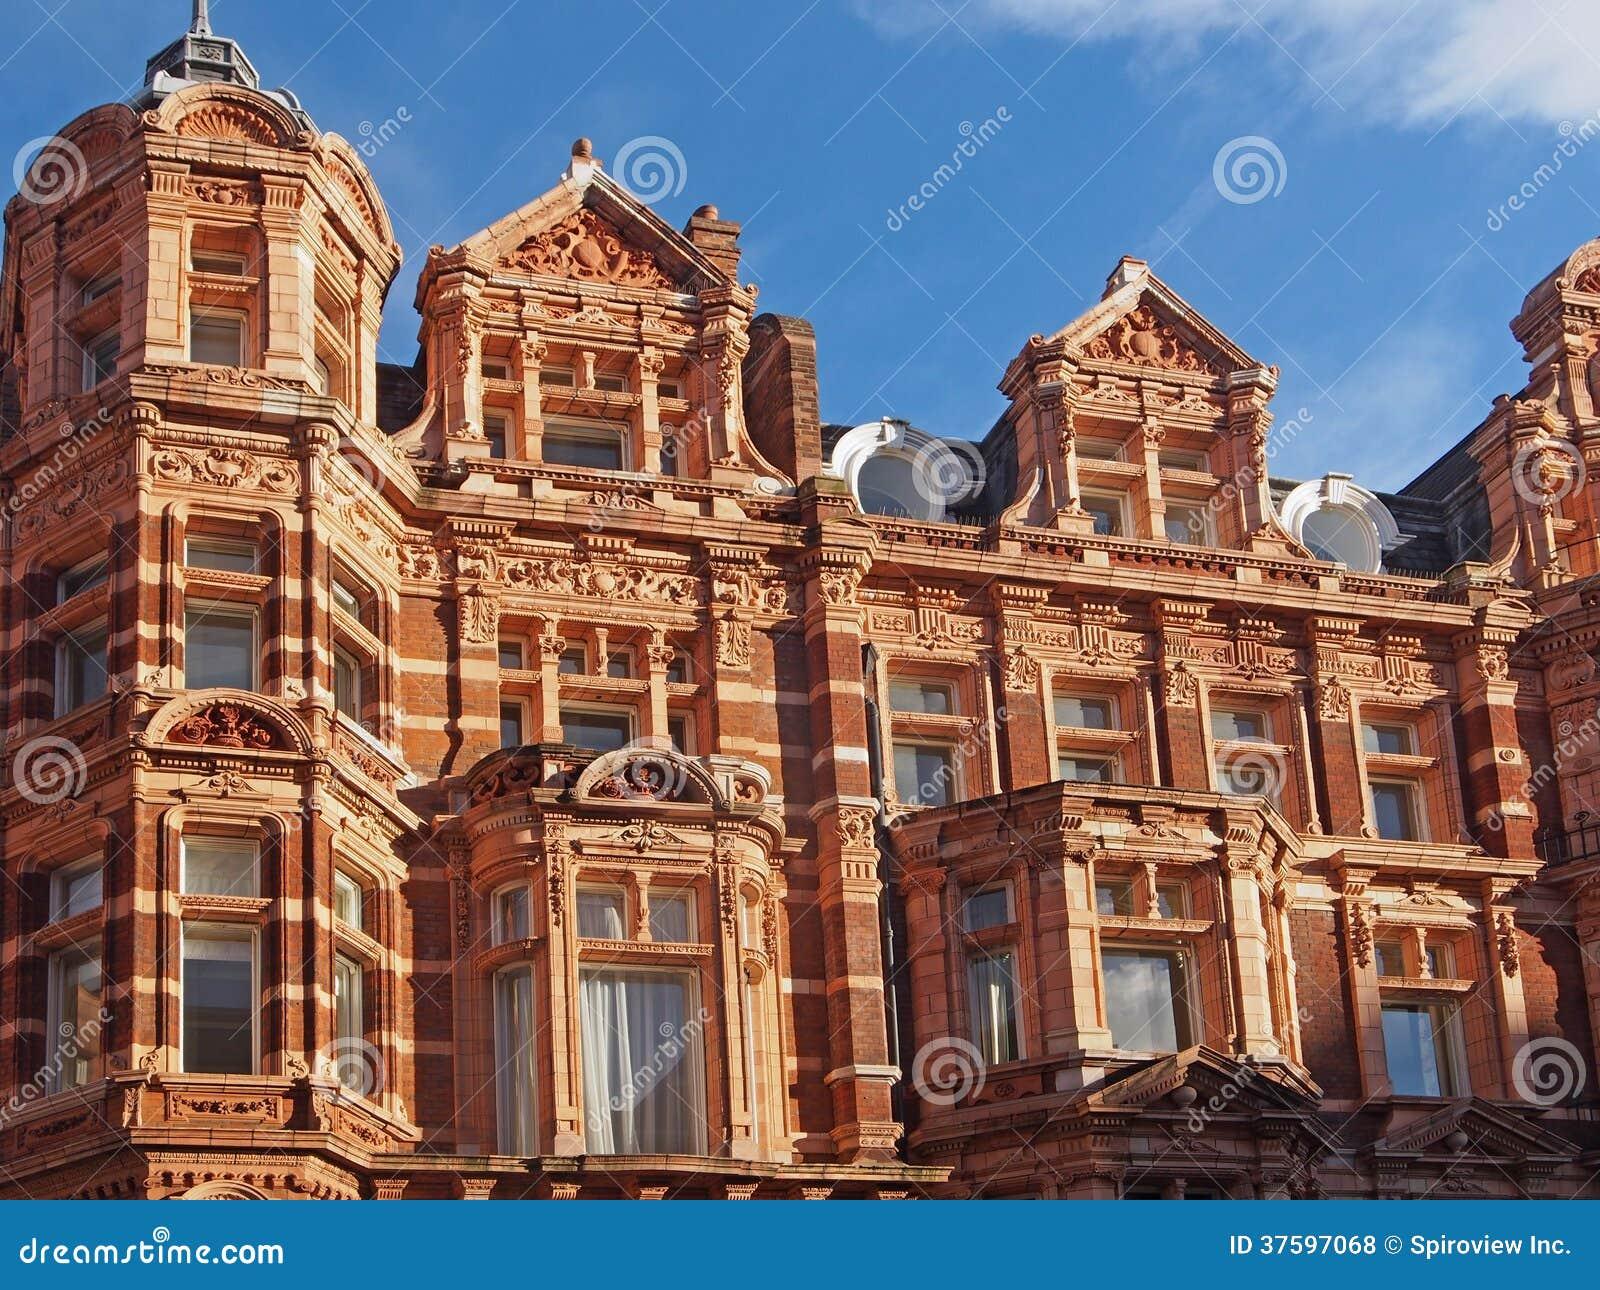 Fancy Apartment Building london fancy apartment building royalty free stock photos - image